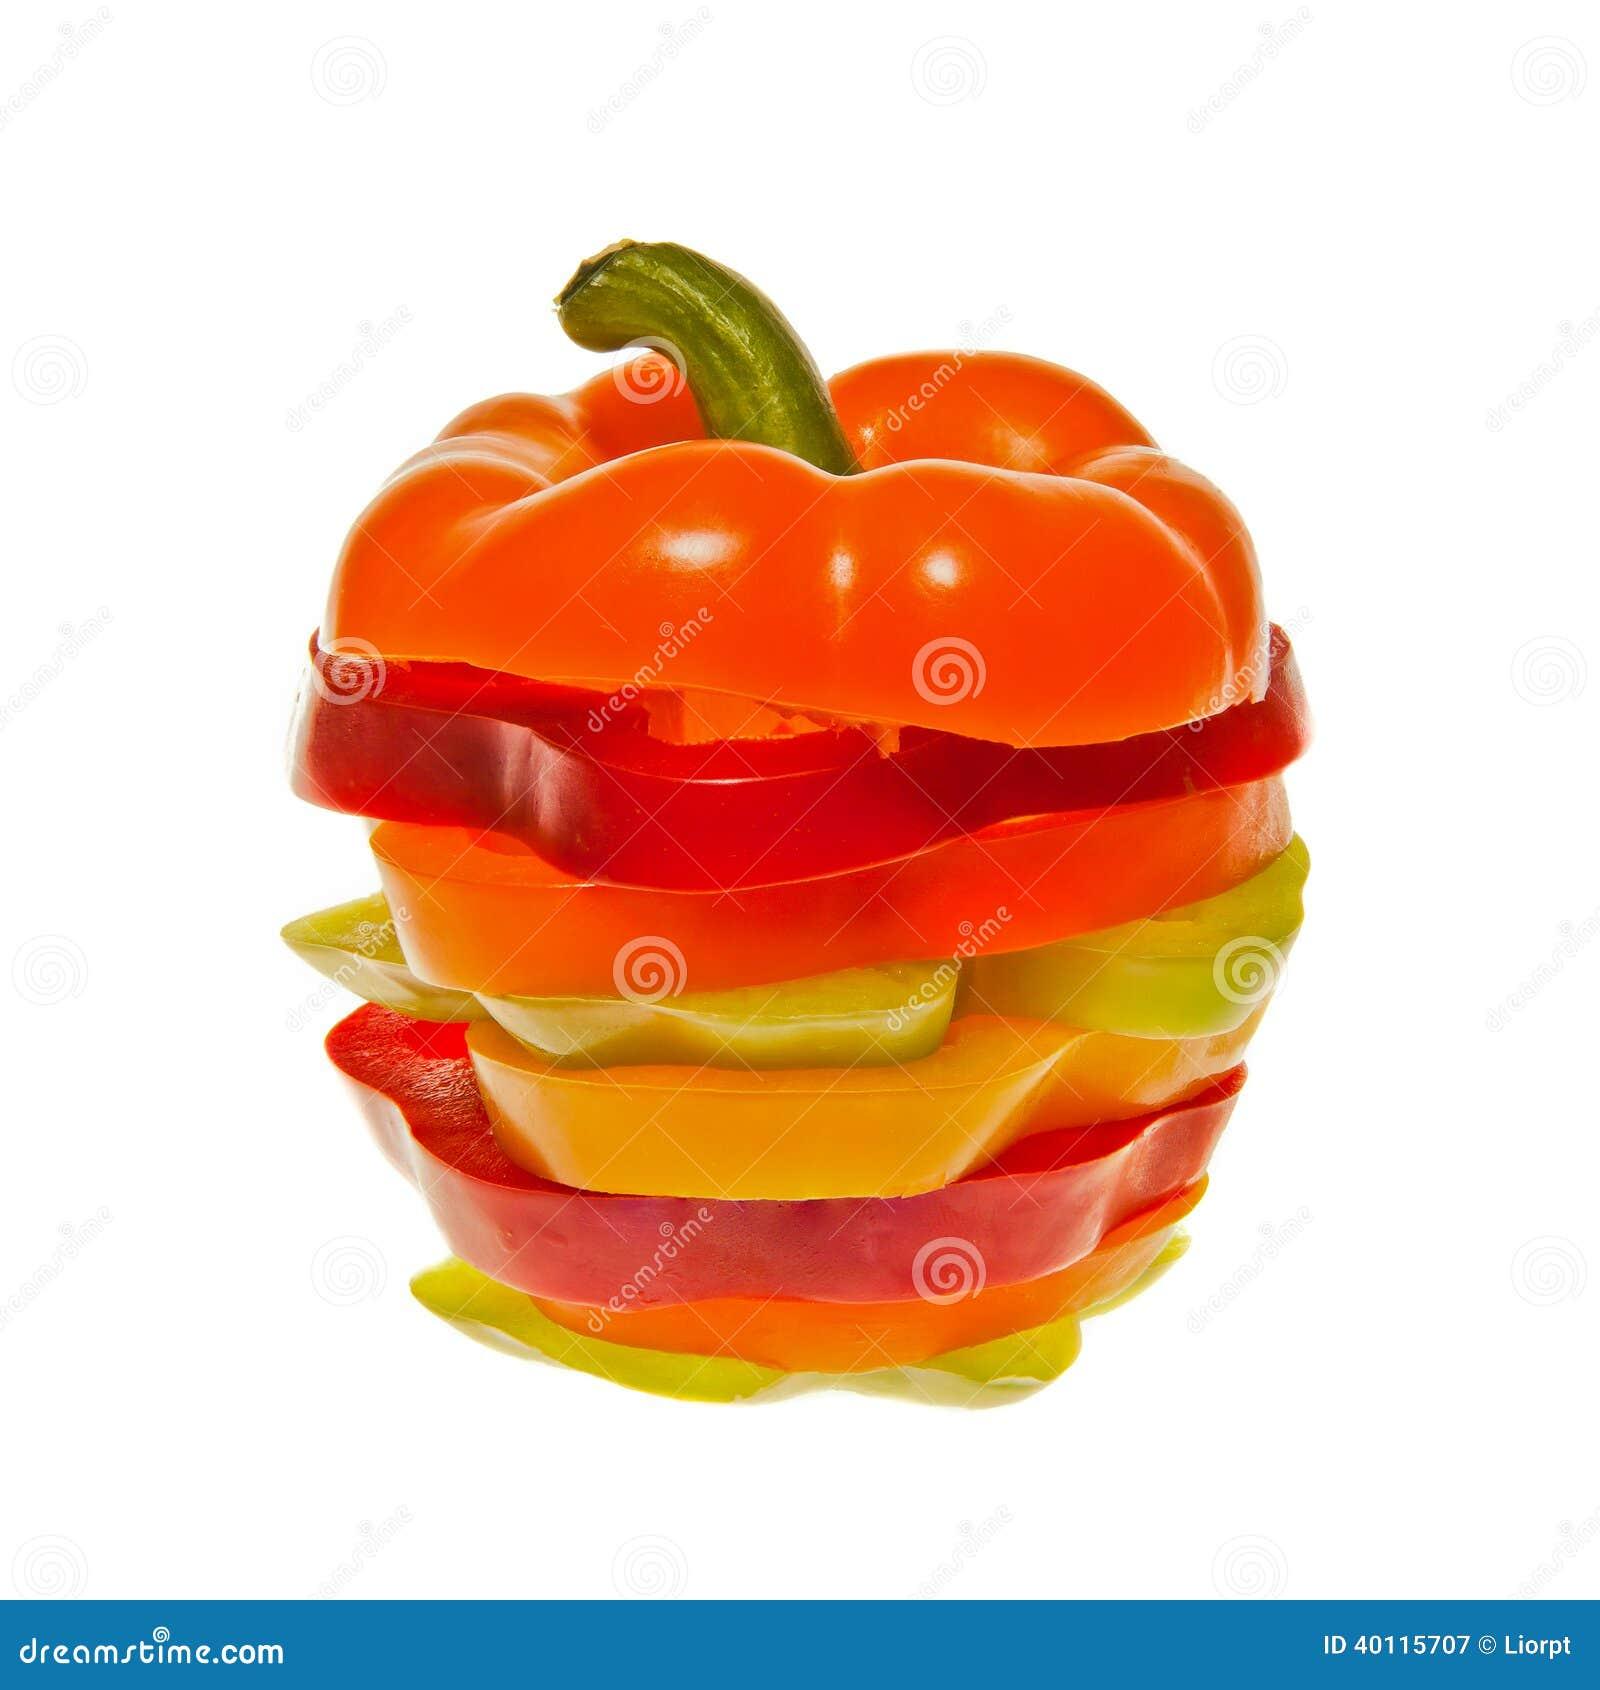 Pila di peperoni dolci affettati